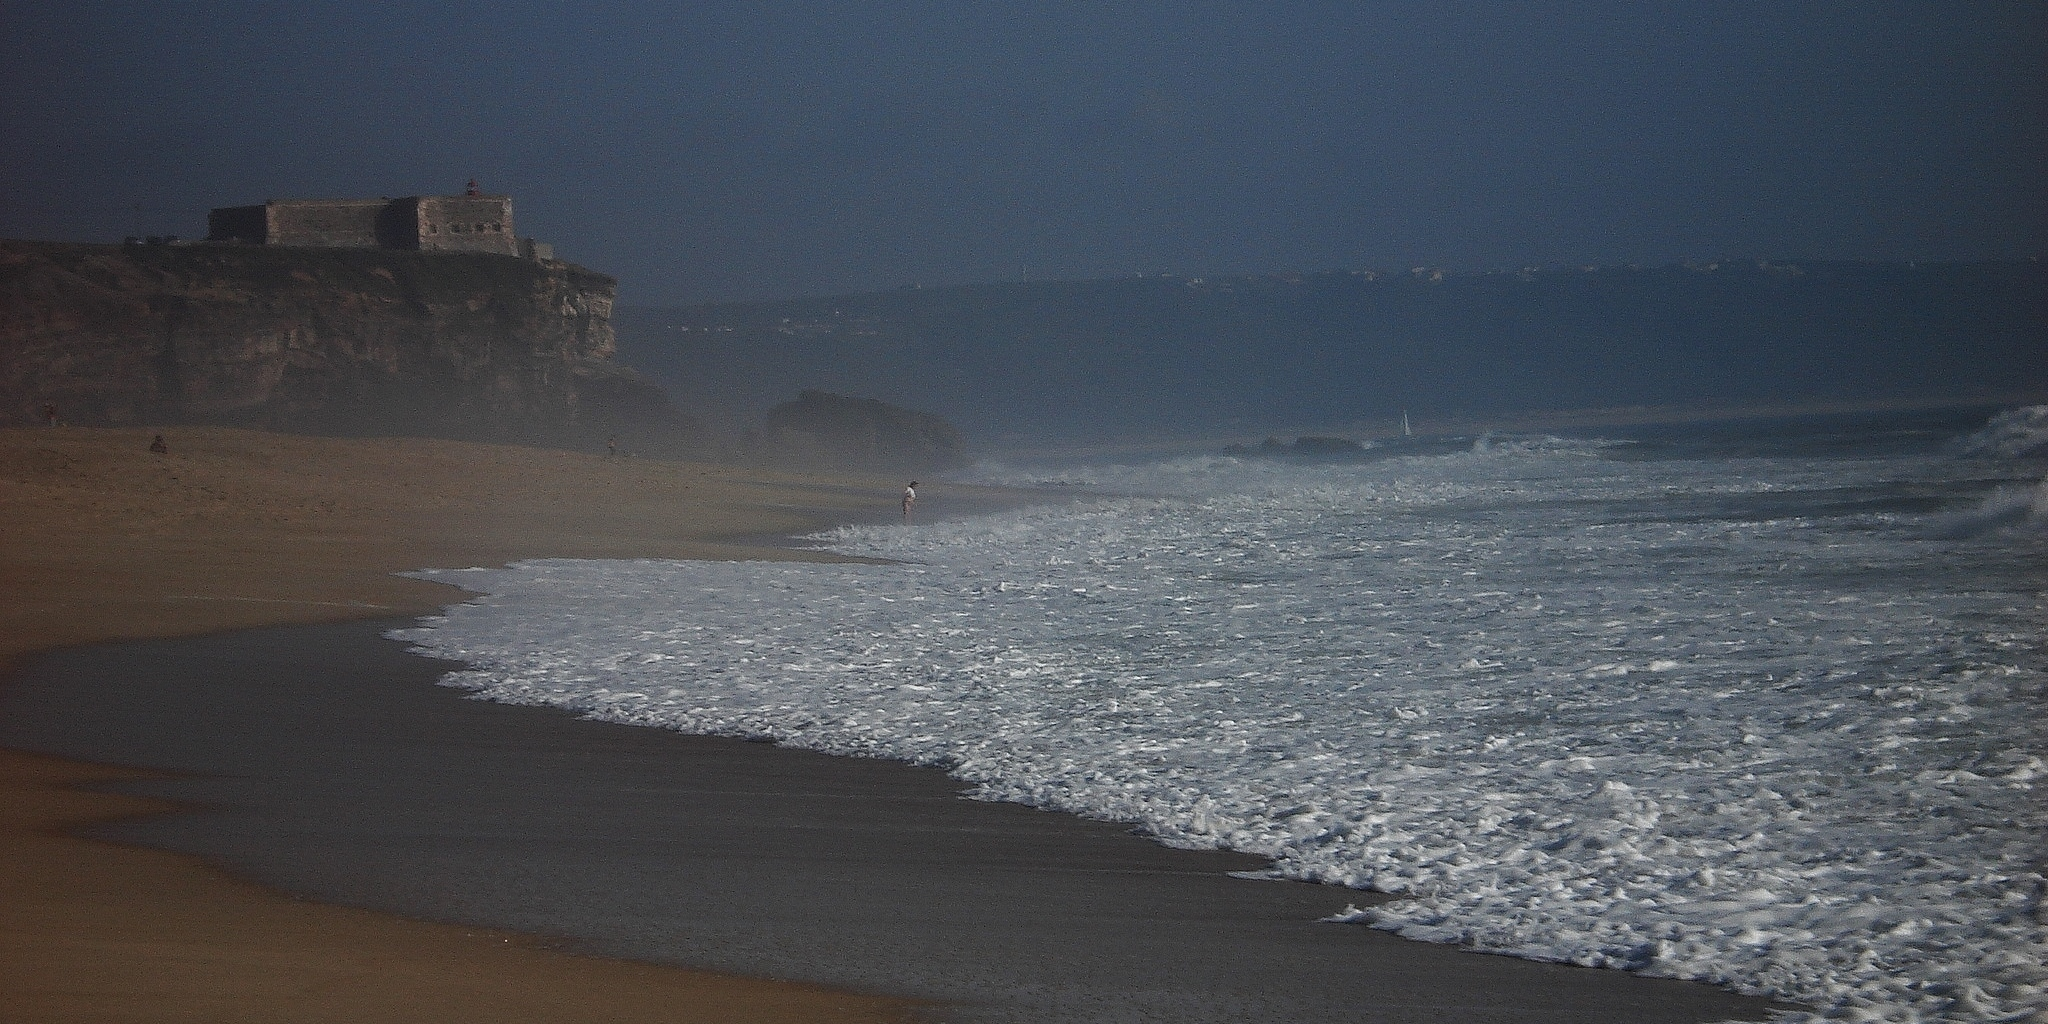 Praia do Norte - Nazaré - Portugal